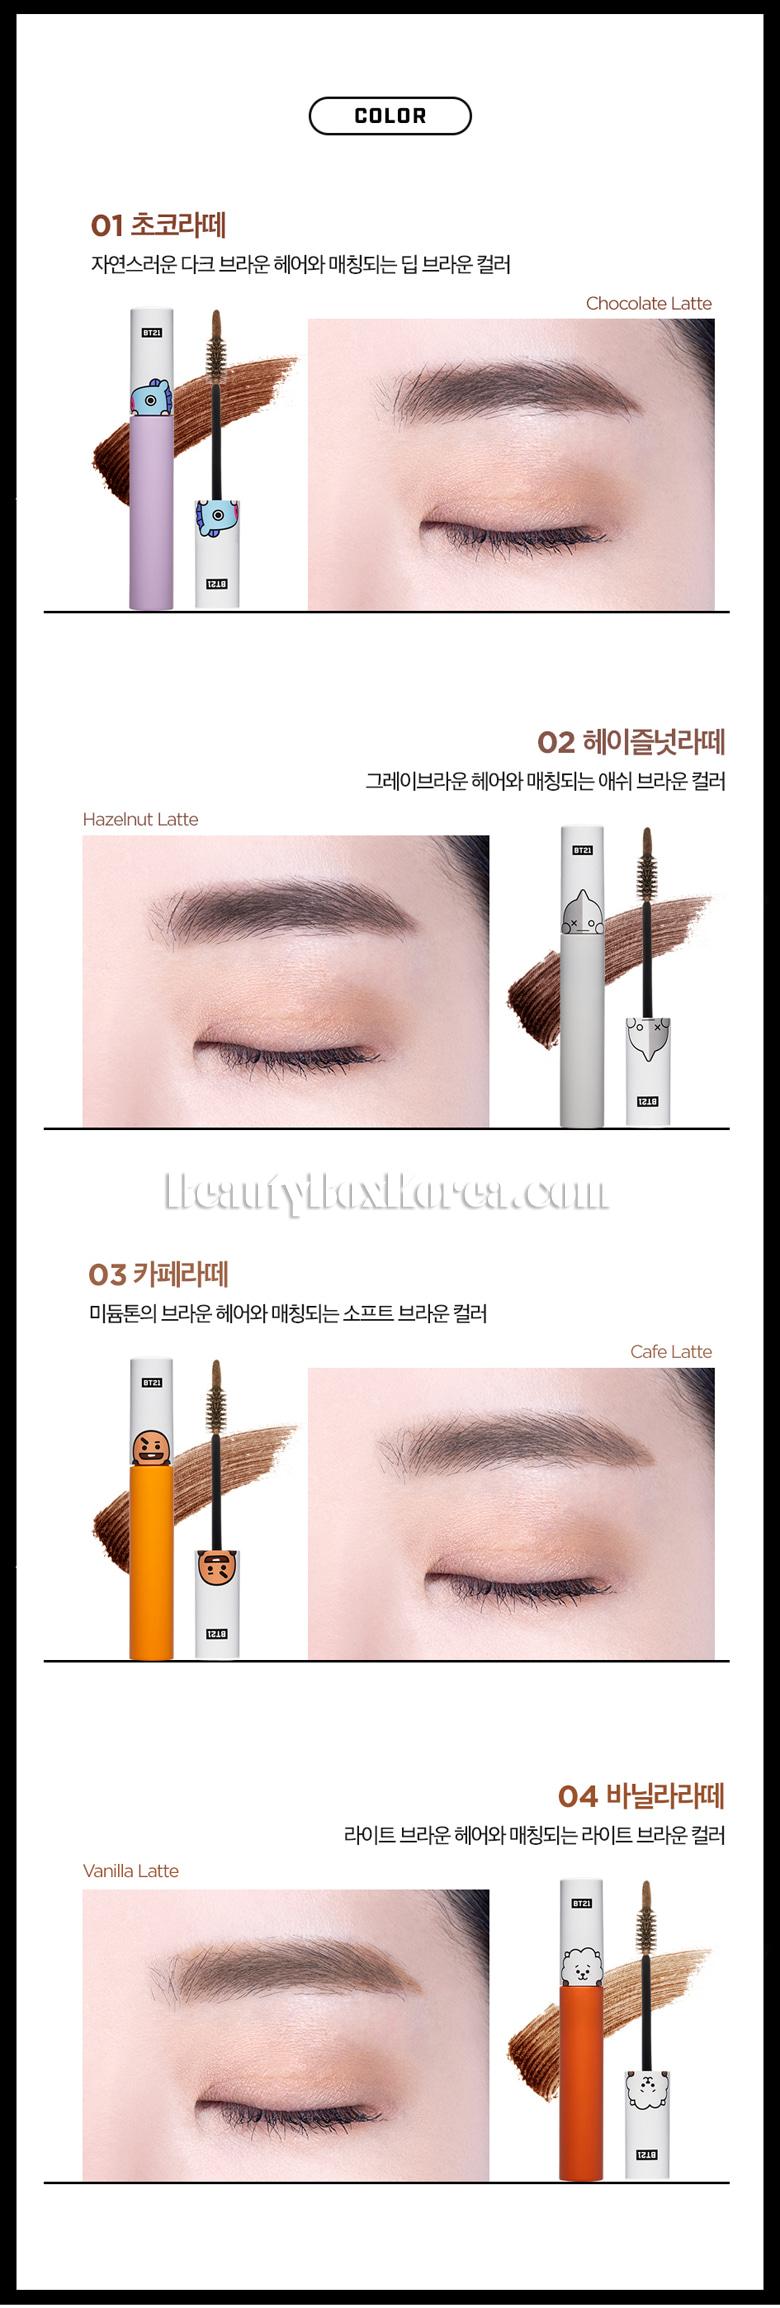 Beauty Box Korea - VT COSMETICS BT21 Air Fit Tattoo Brow 7g[VTxBT21